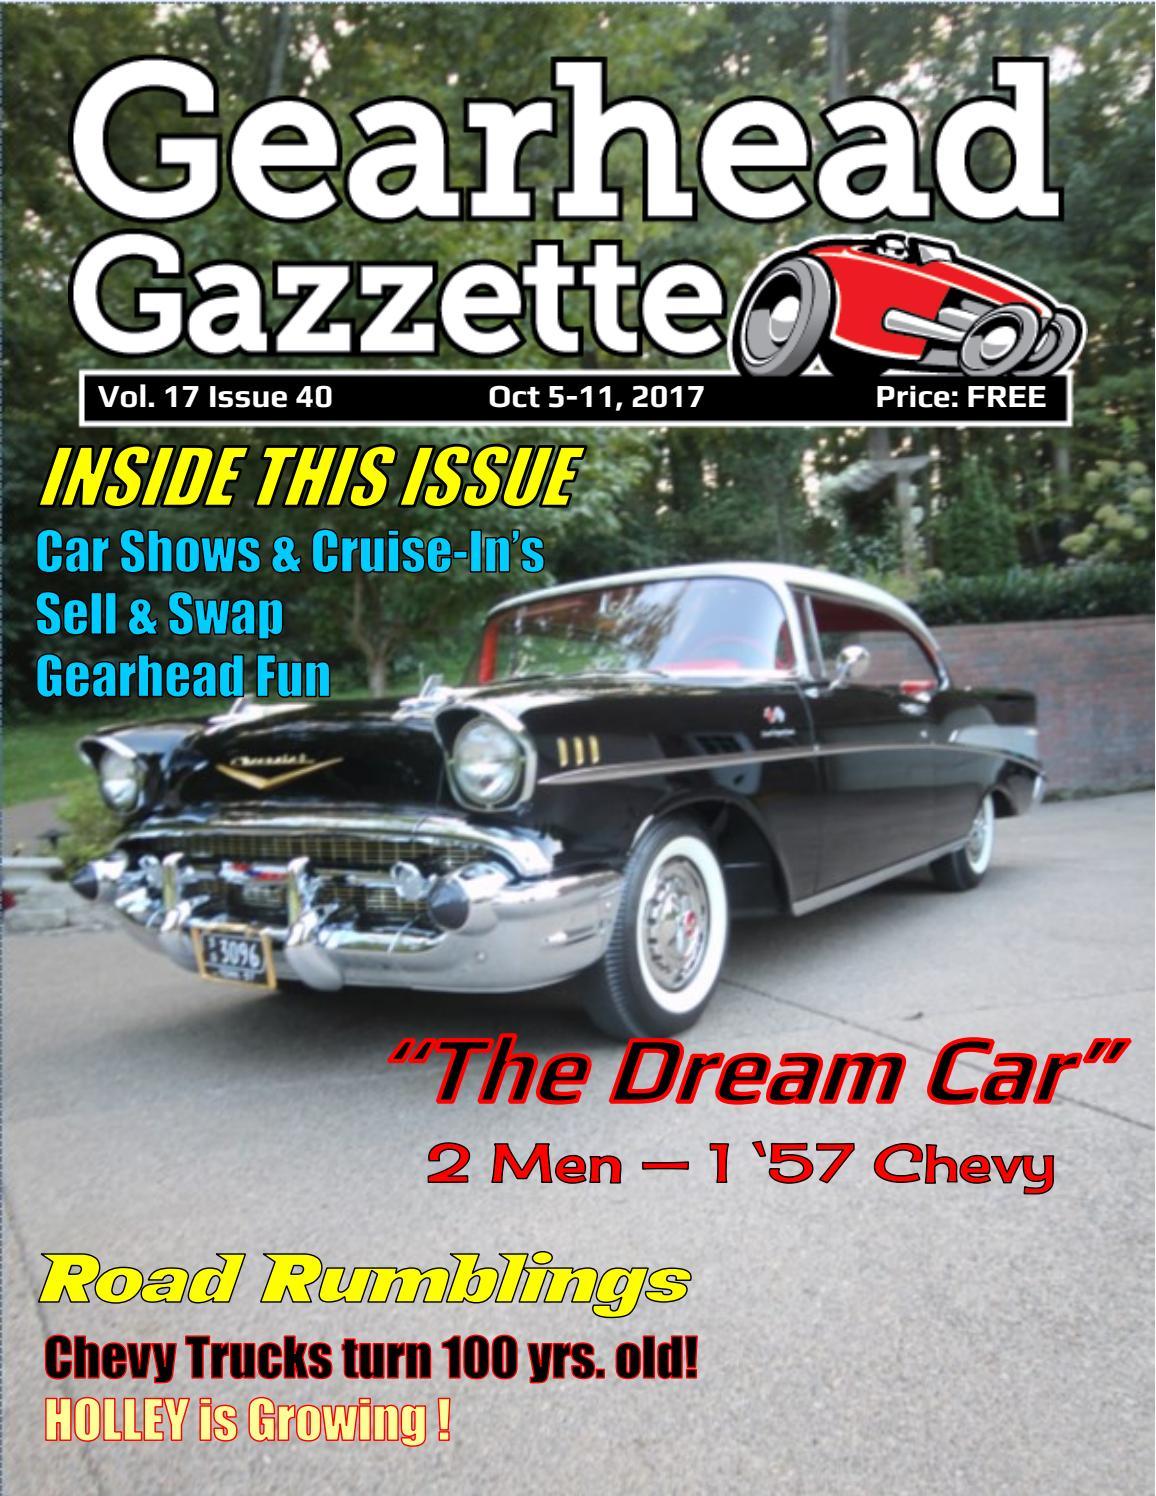 Gearhead Gazzette Vol 17 Issue 40 Oct 5-11, 2017 by Jimmy B - issuu